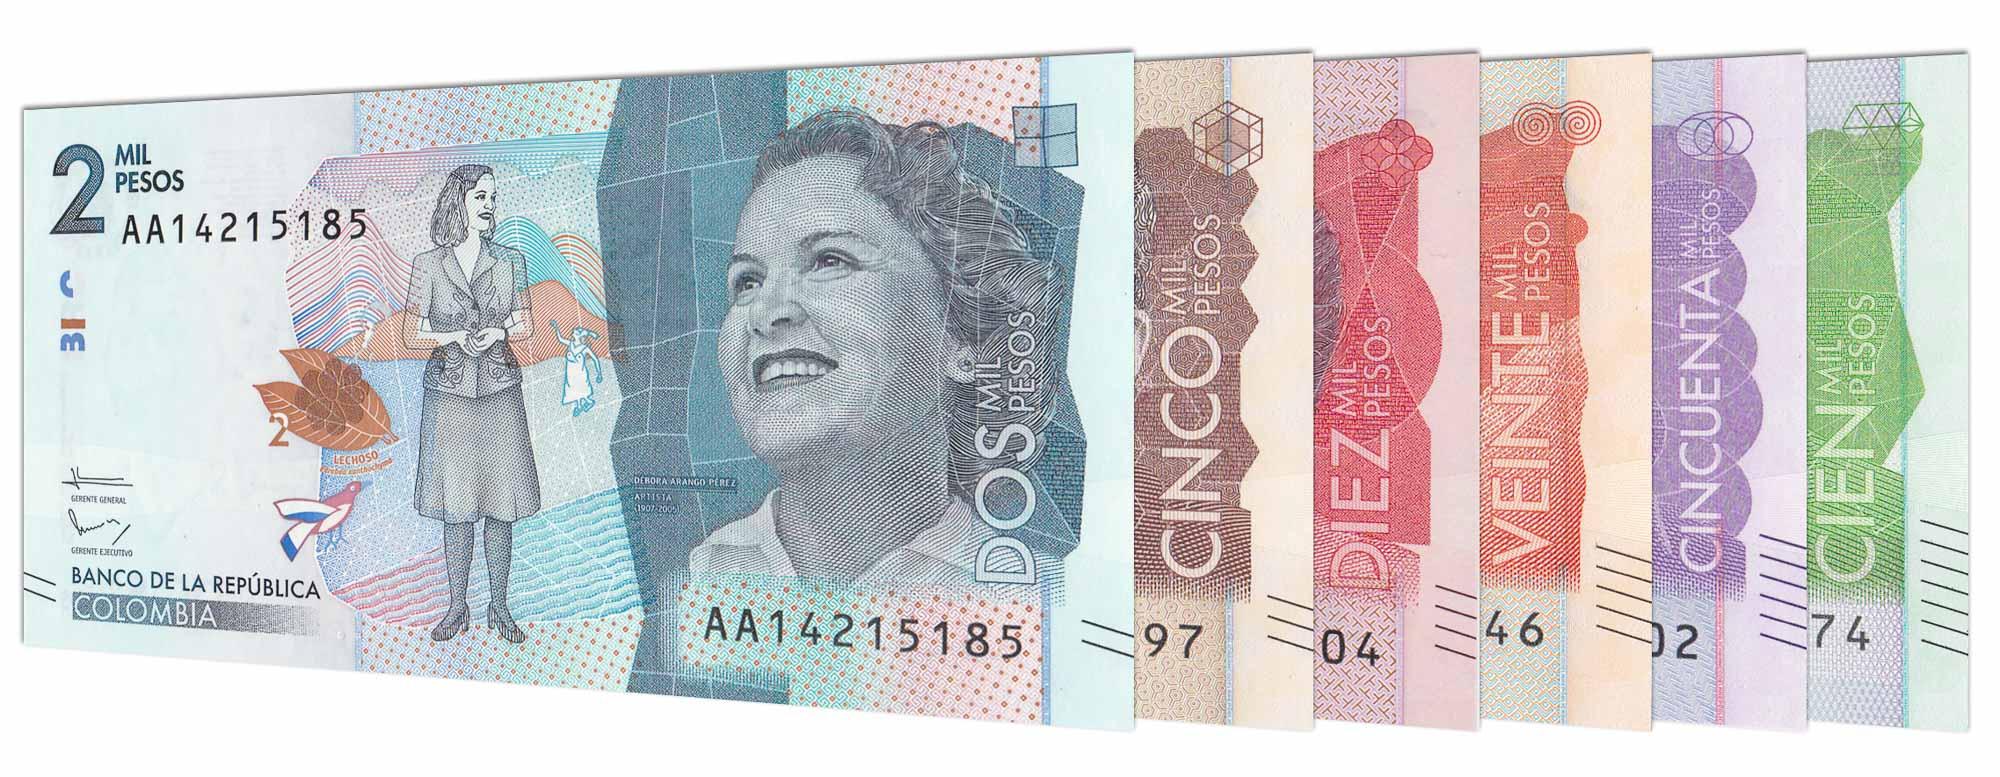 Colombian Pesos Online Cop Home